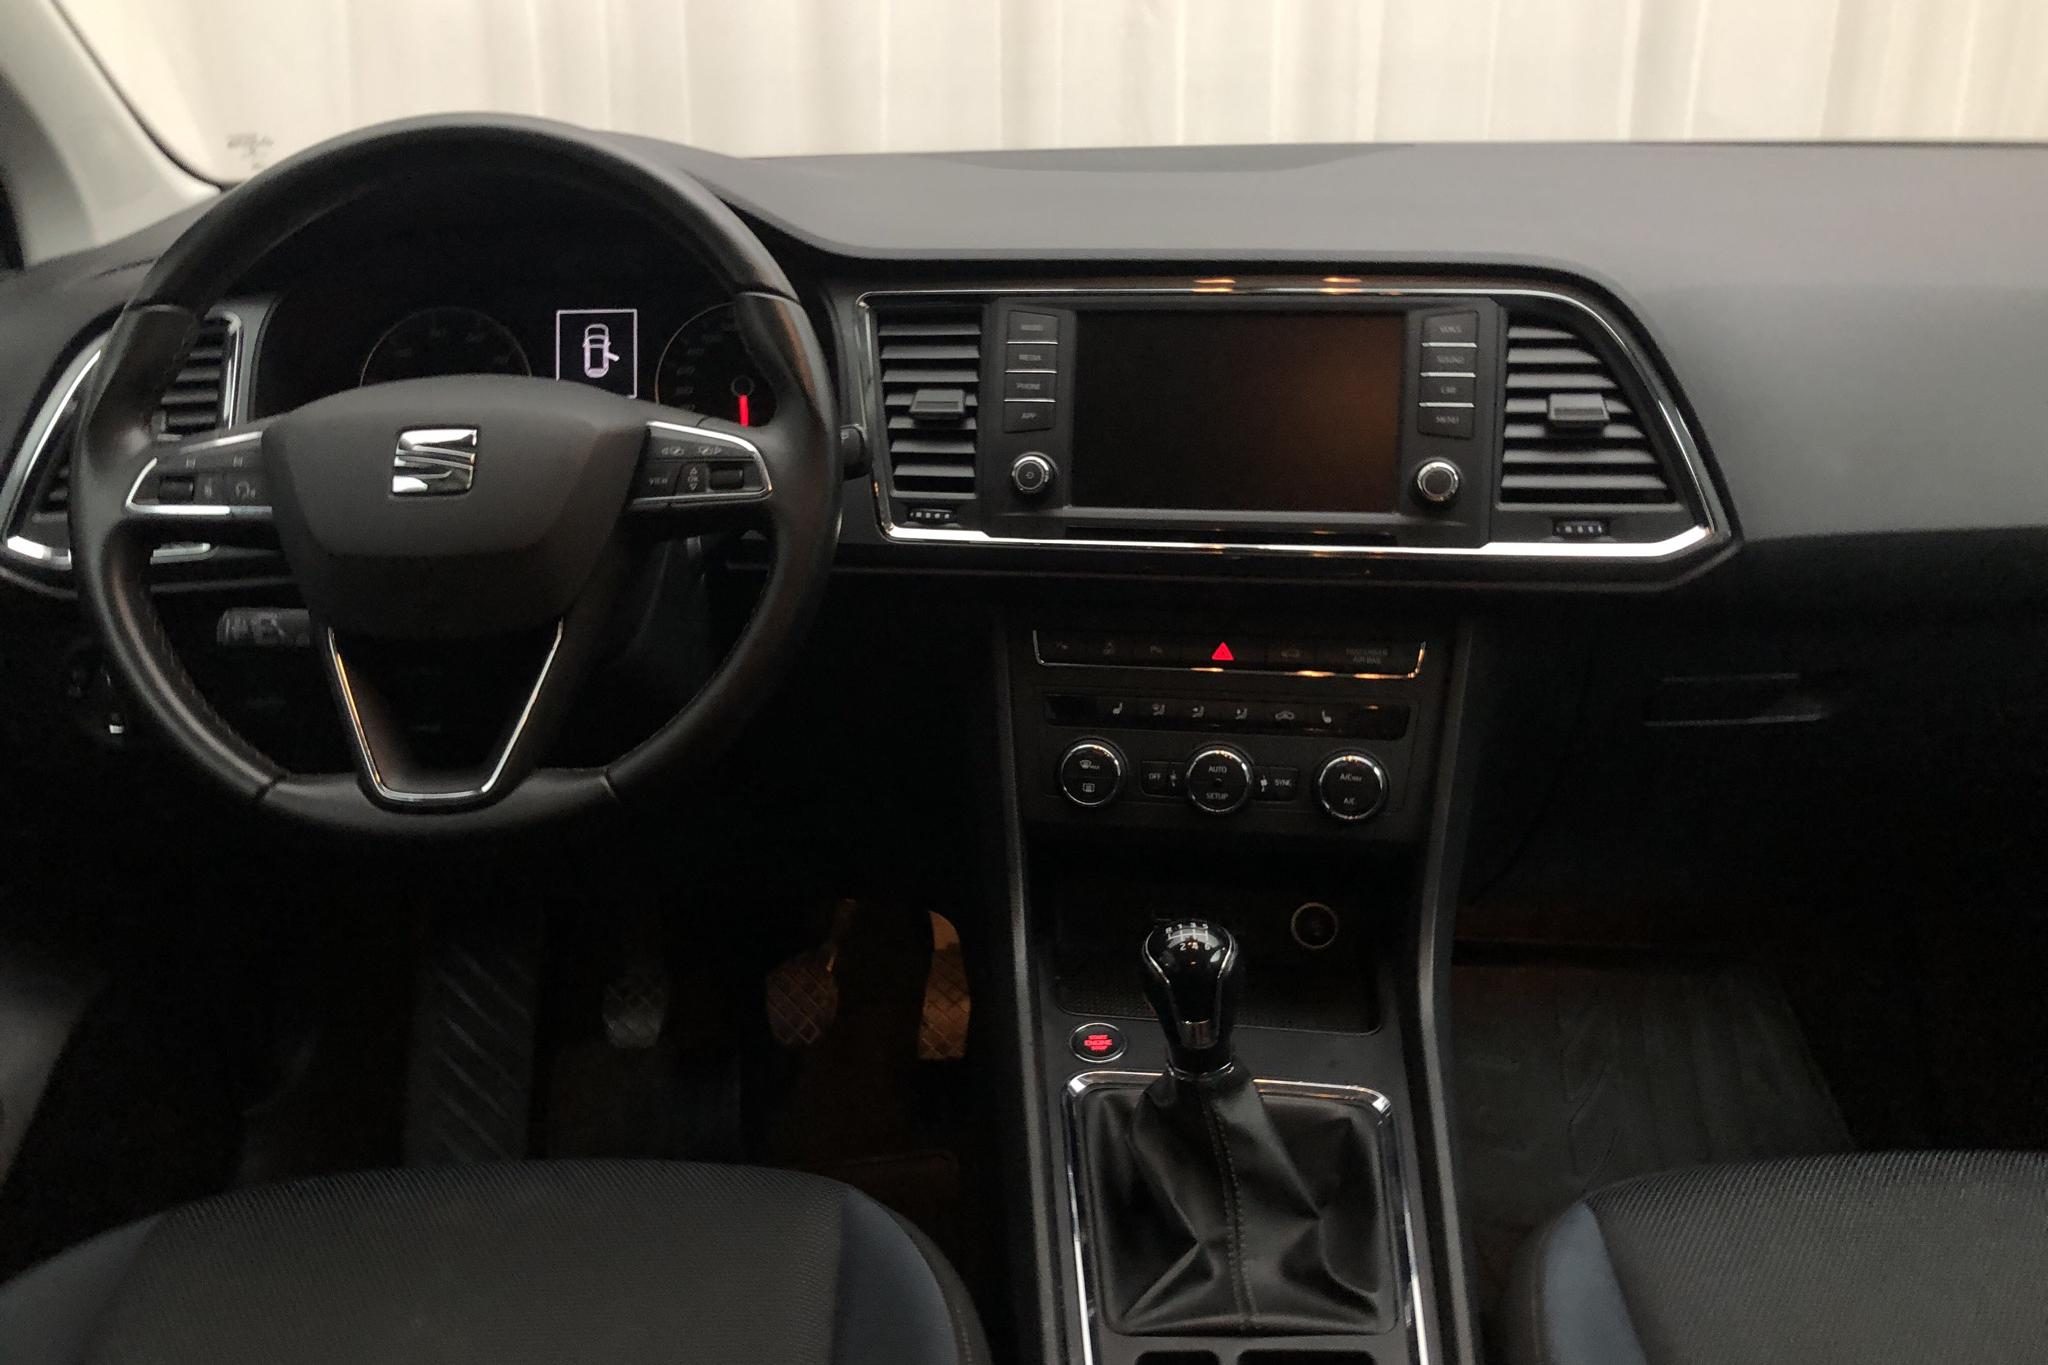 Seat Ateca 1.0 TSI (115hk) - 60 270 km - Manual - white - 2018